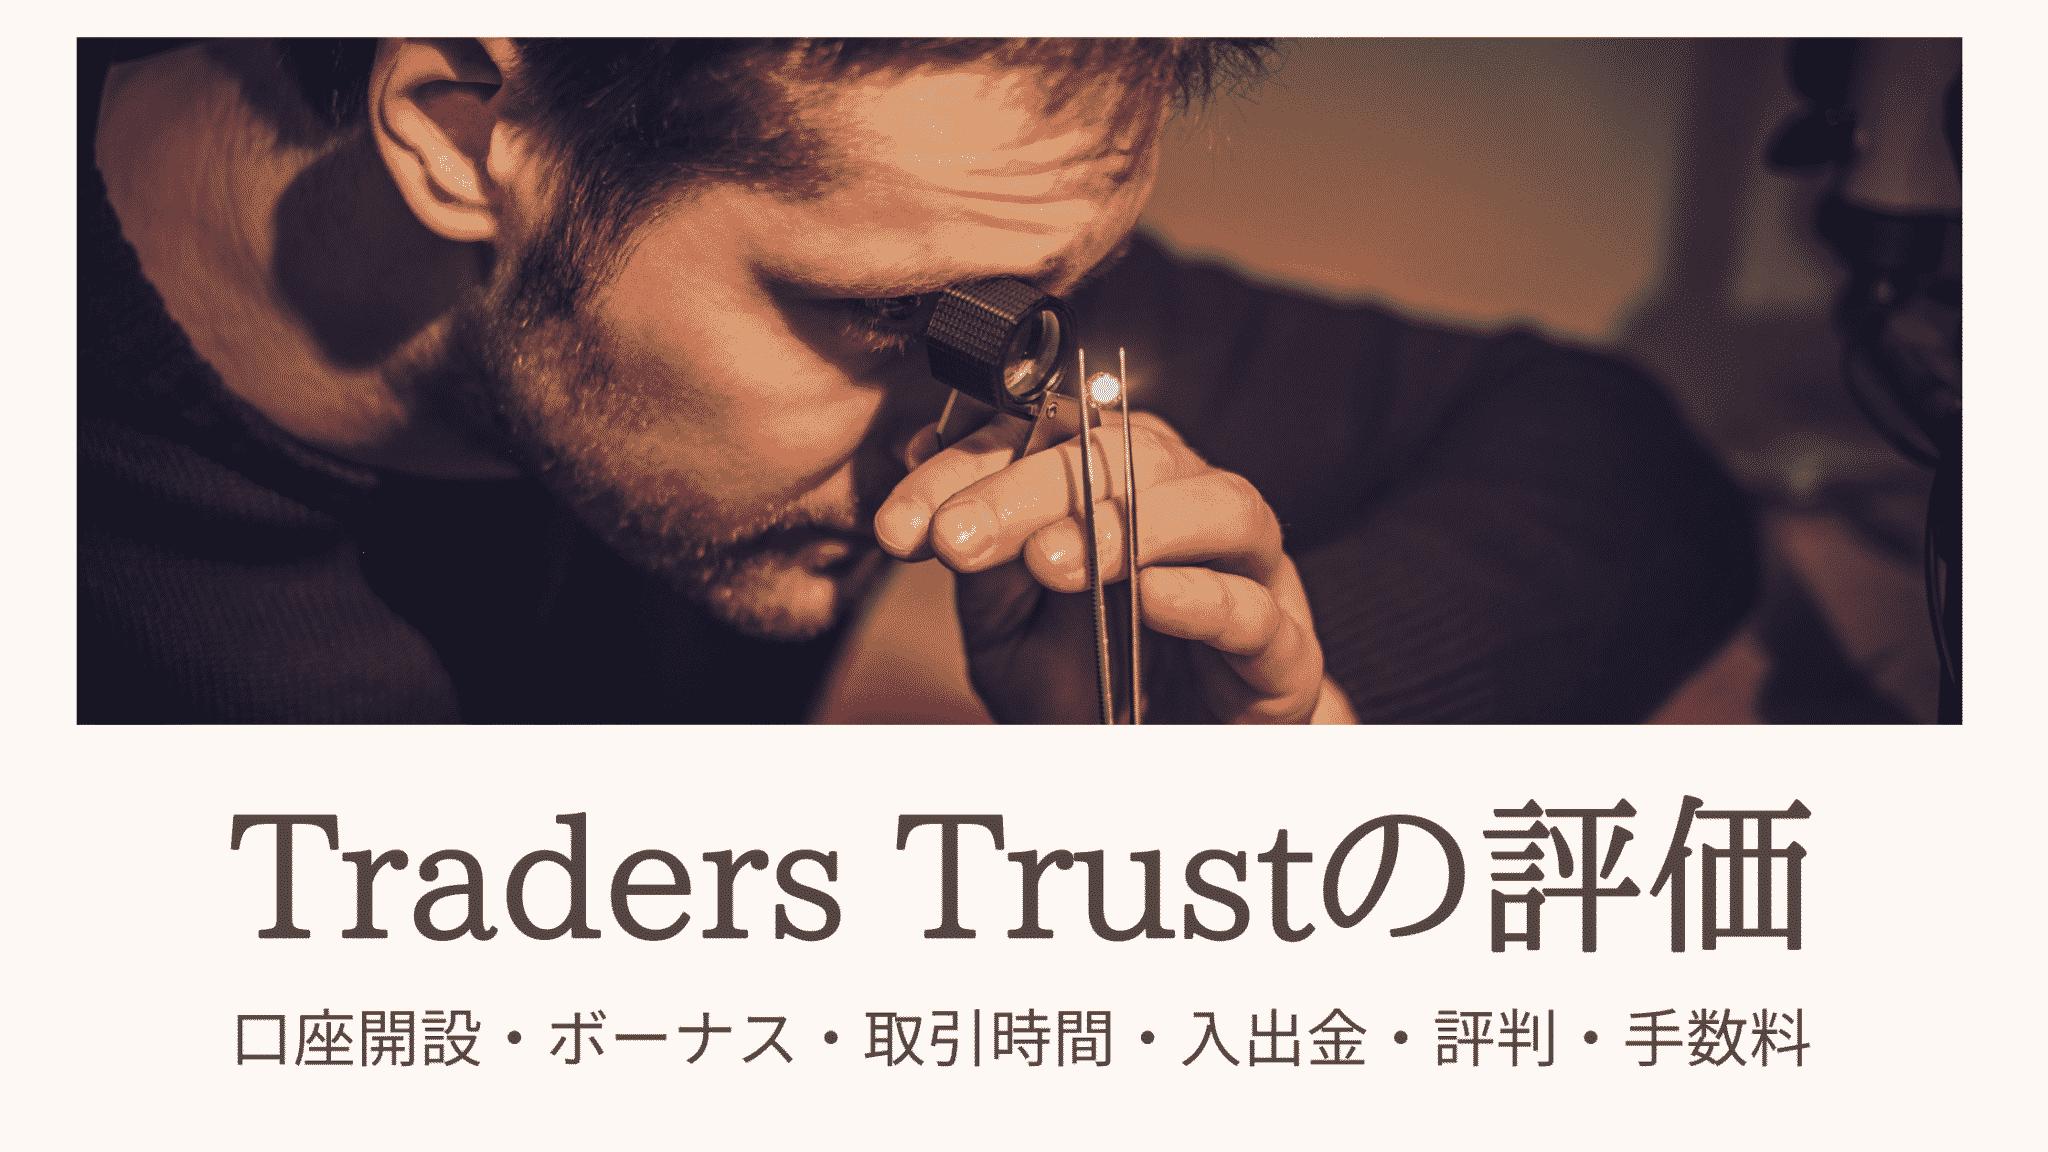 Traders trust|口座開設・ボーナス・取引時間・入出金・評判・手数料